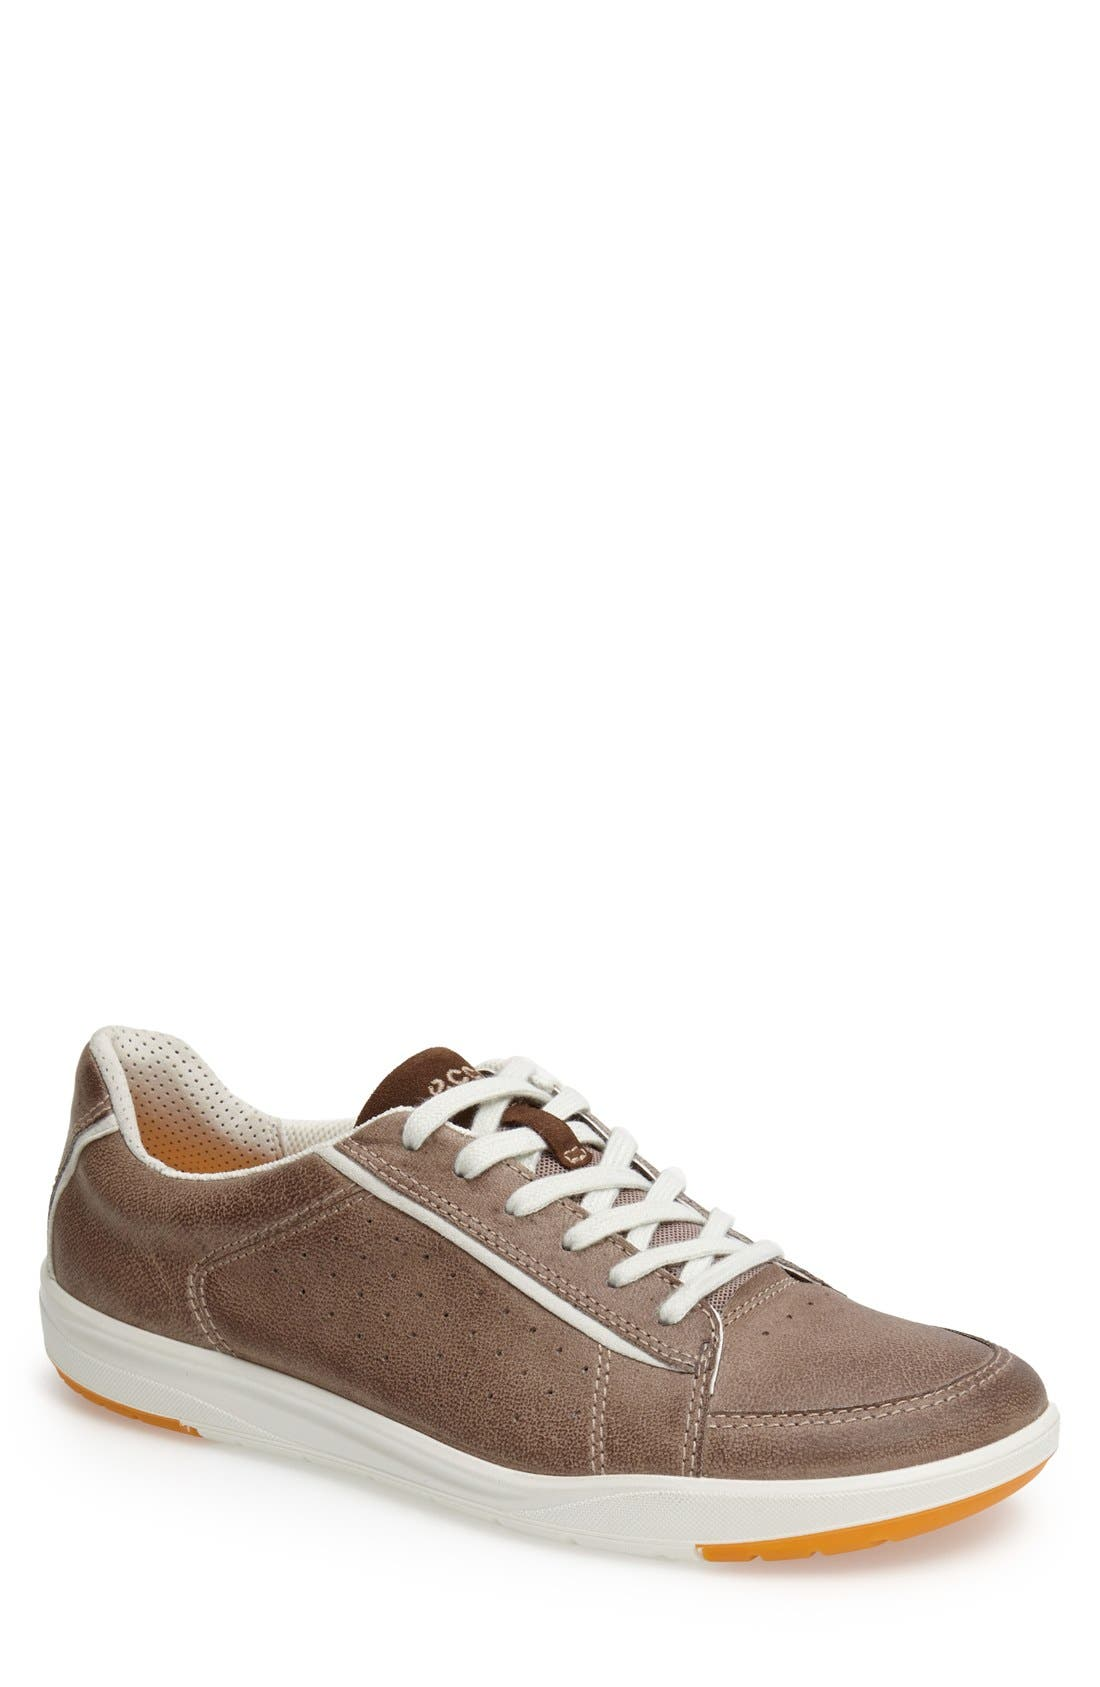 Main Image - ECCO 'Eldon' Sneaker (Men)